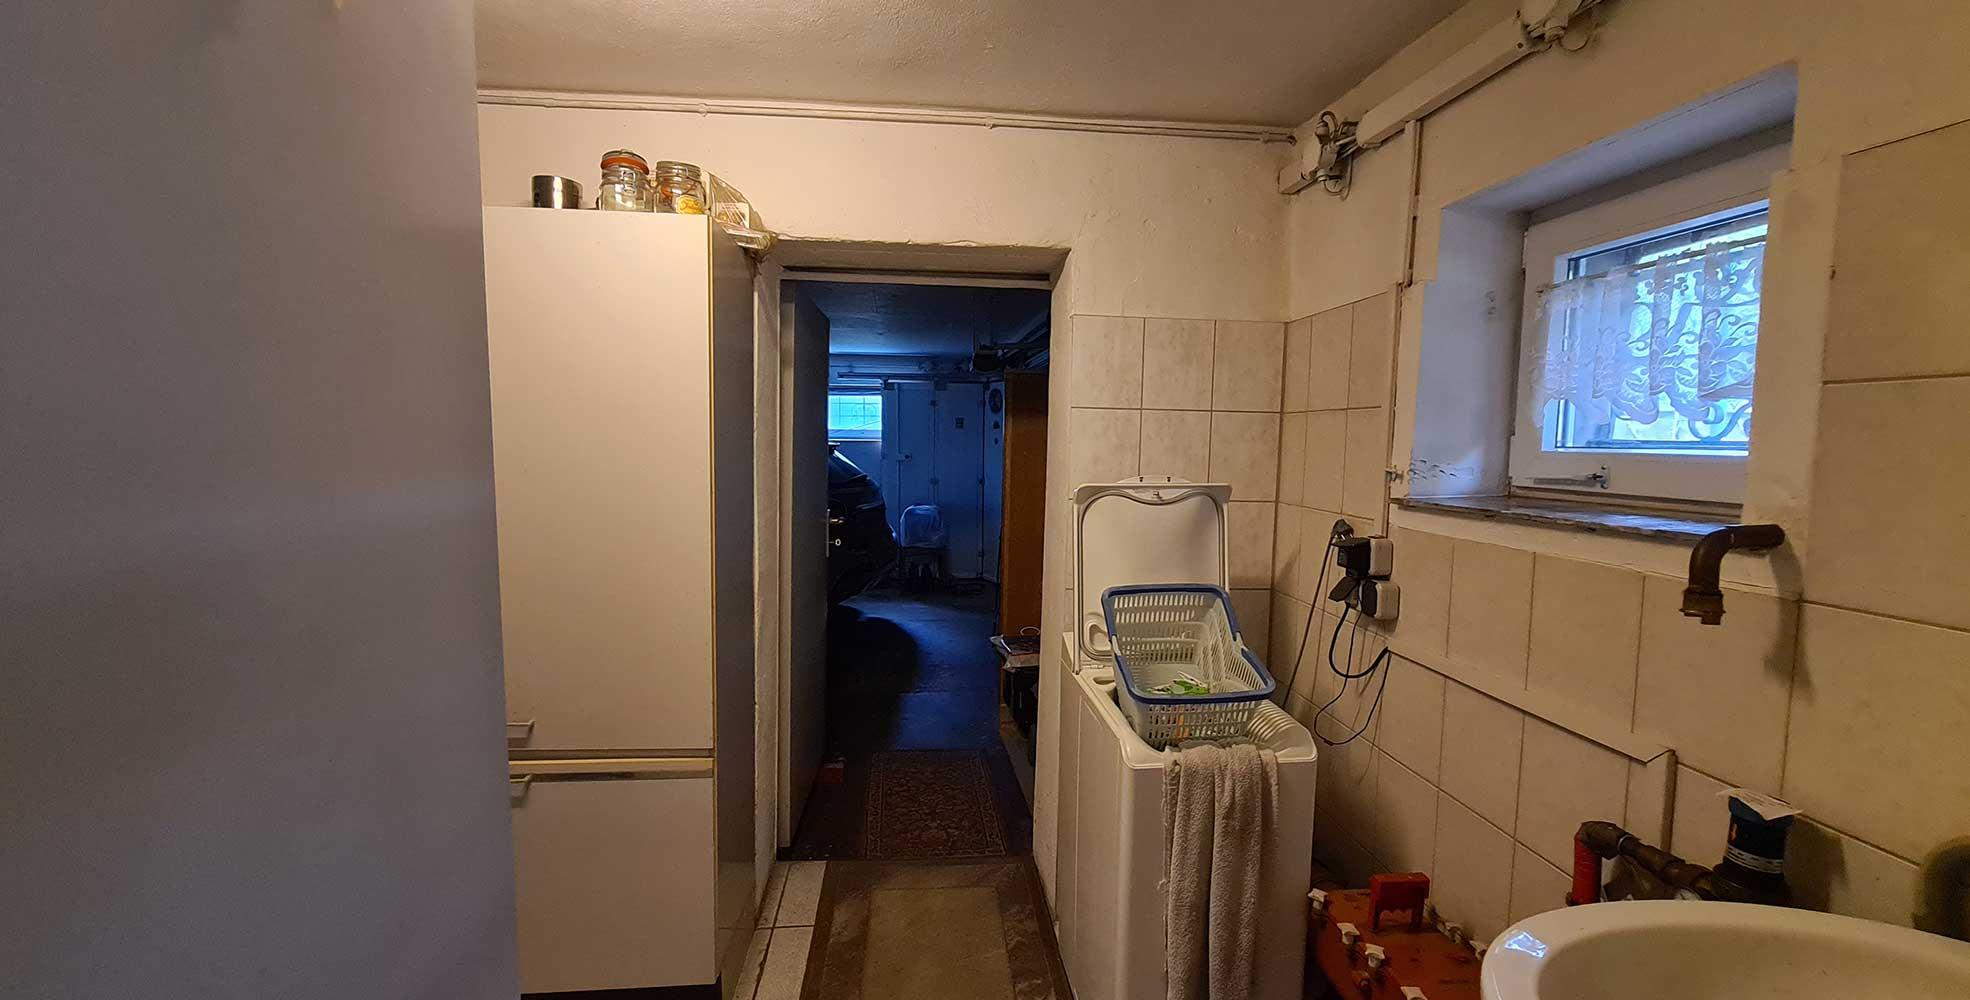 Einfamilienhaus in Berlin - Kaulsdorf - Keller